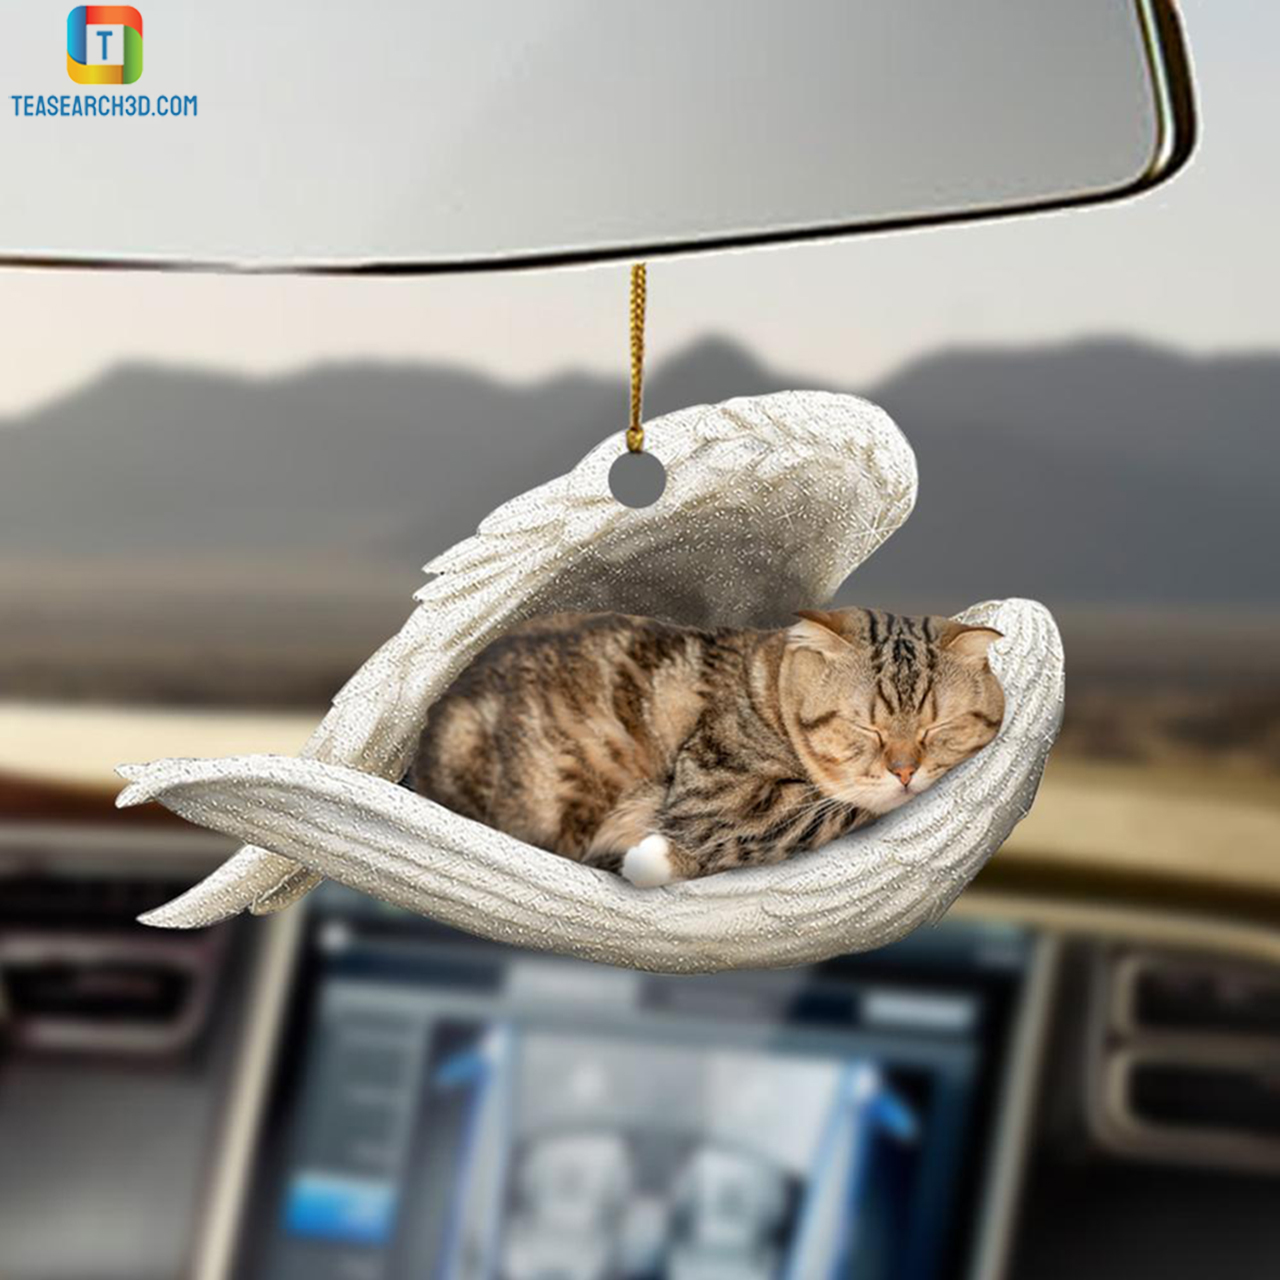 Scottish Fold sleeping angel car hanging ornament 2